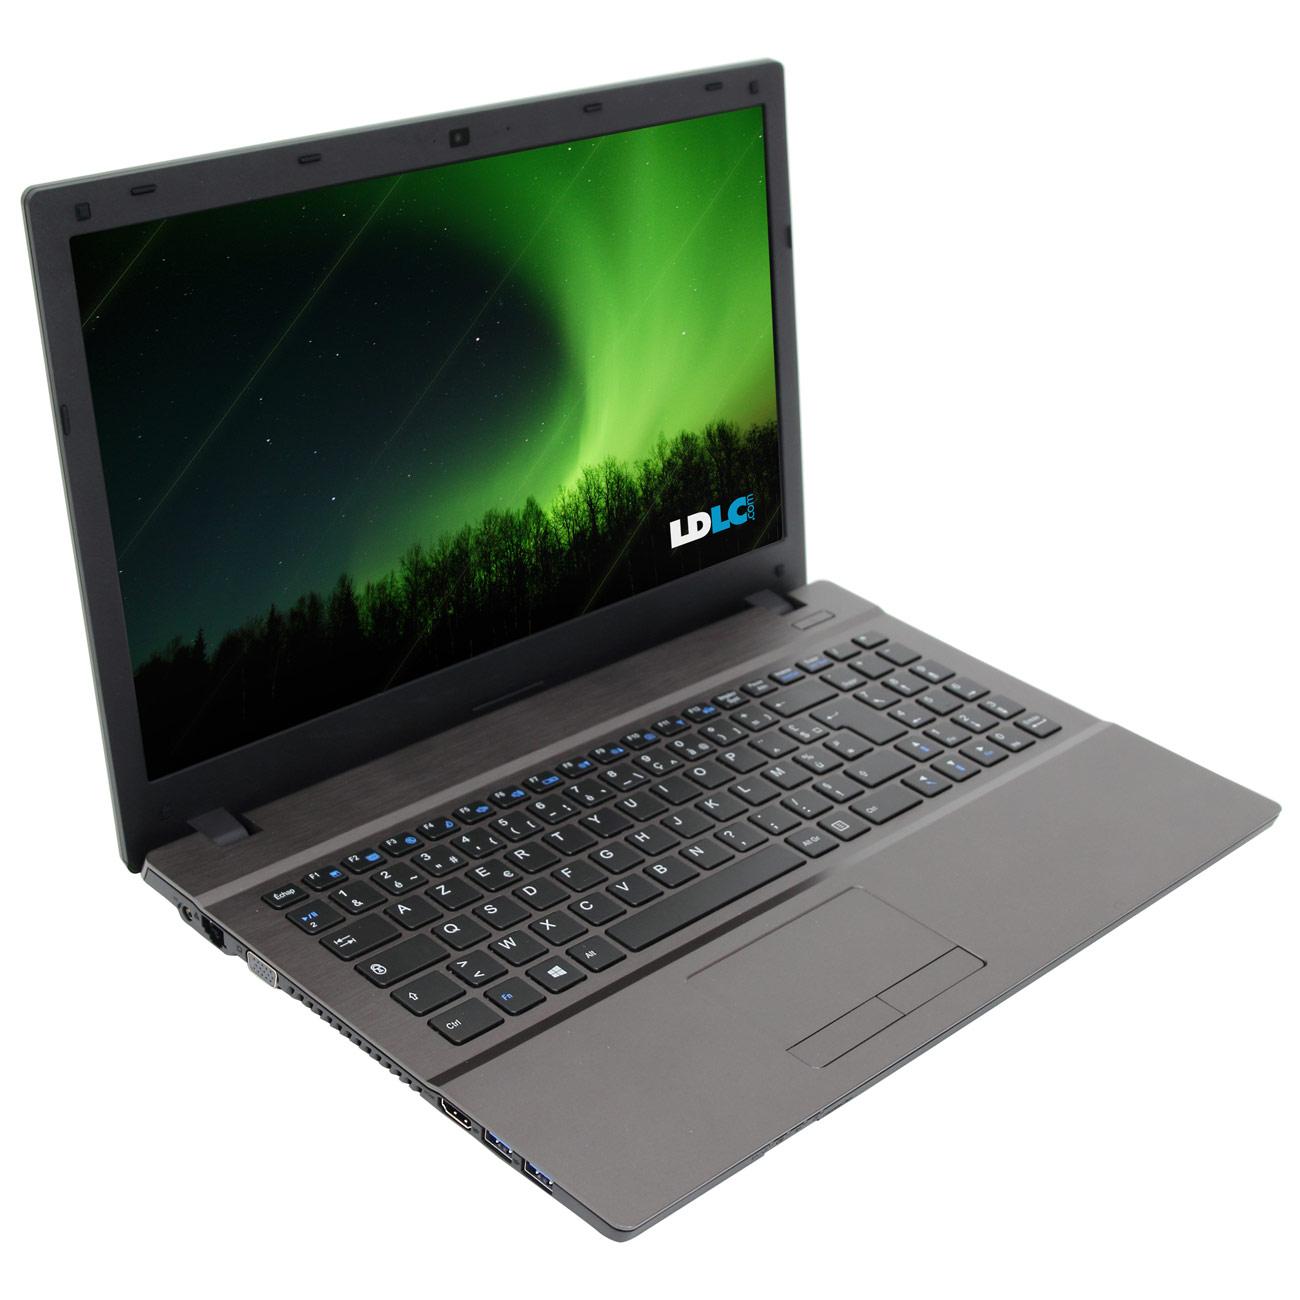 "PC portable LDLC Aurore BB5-I3-8-S1 Slim Intel Core i3-2370M 8 Go SSD 120 Go 15.6"" LED Graveur DVD Wi-Fi N/Bluetooth Webcam (sans OS)"